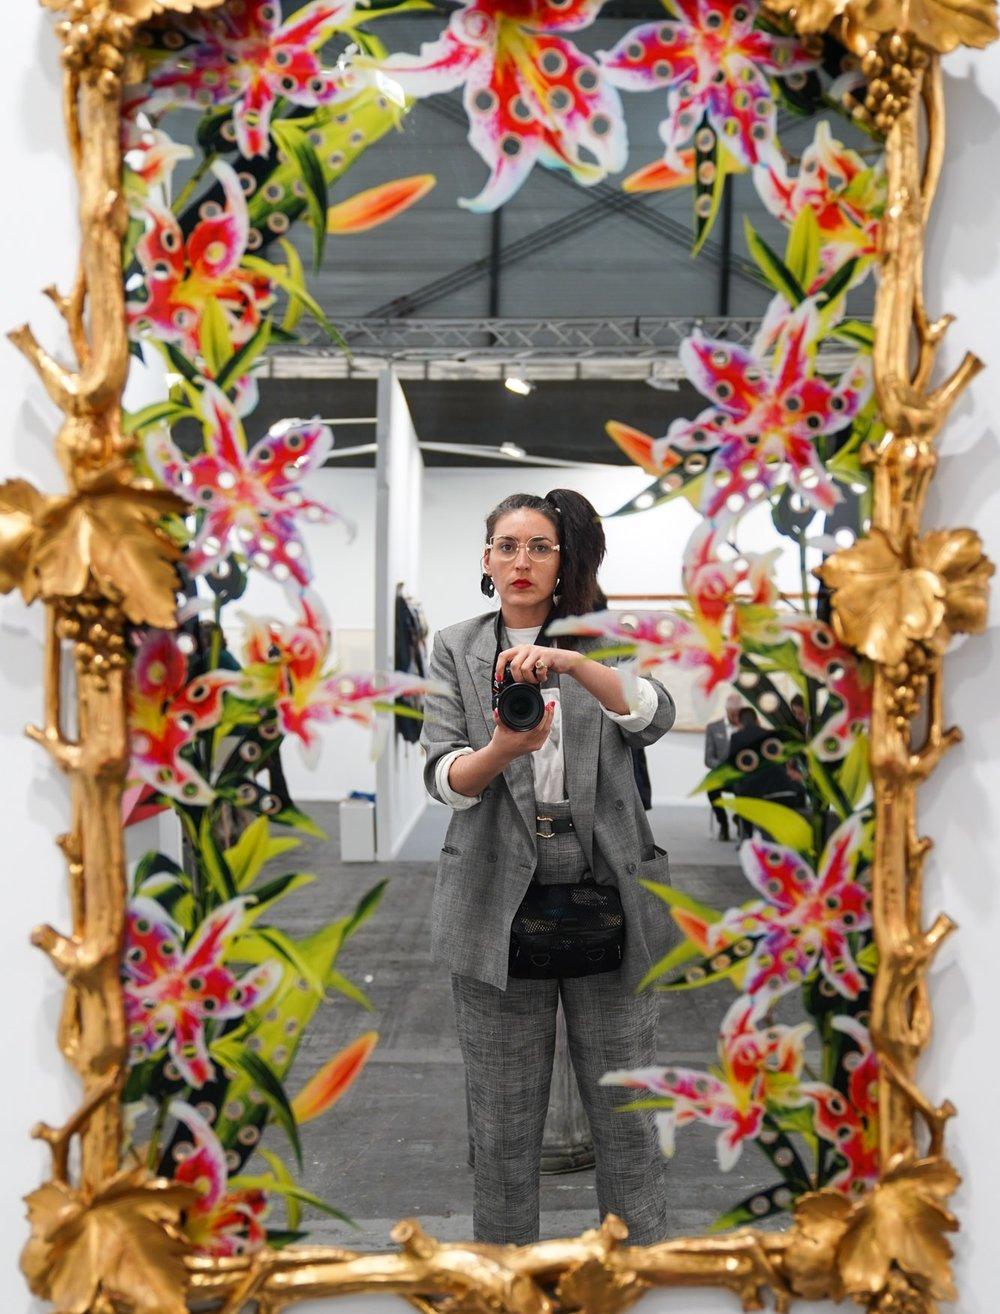 CaballeroCosmica-Exhibitionphoto-Arco2019--27.jpg